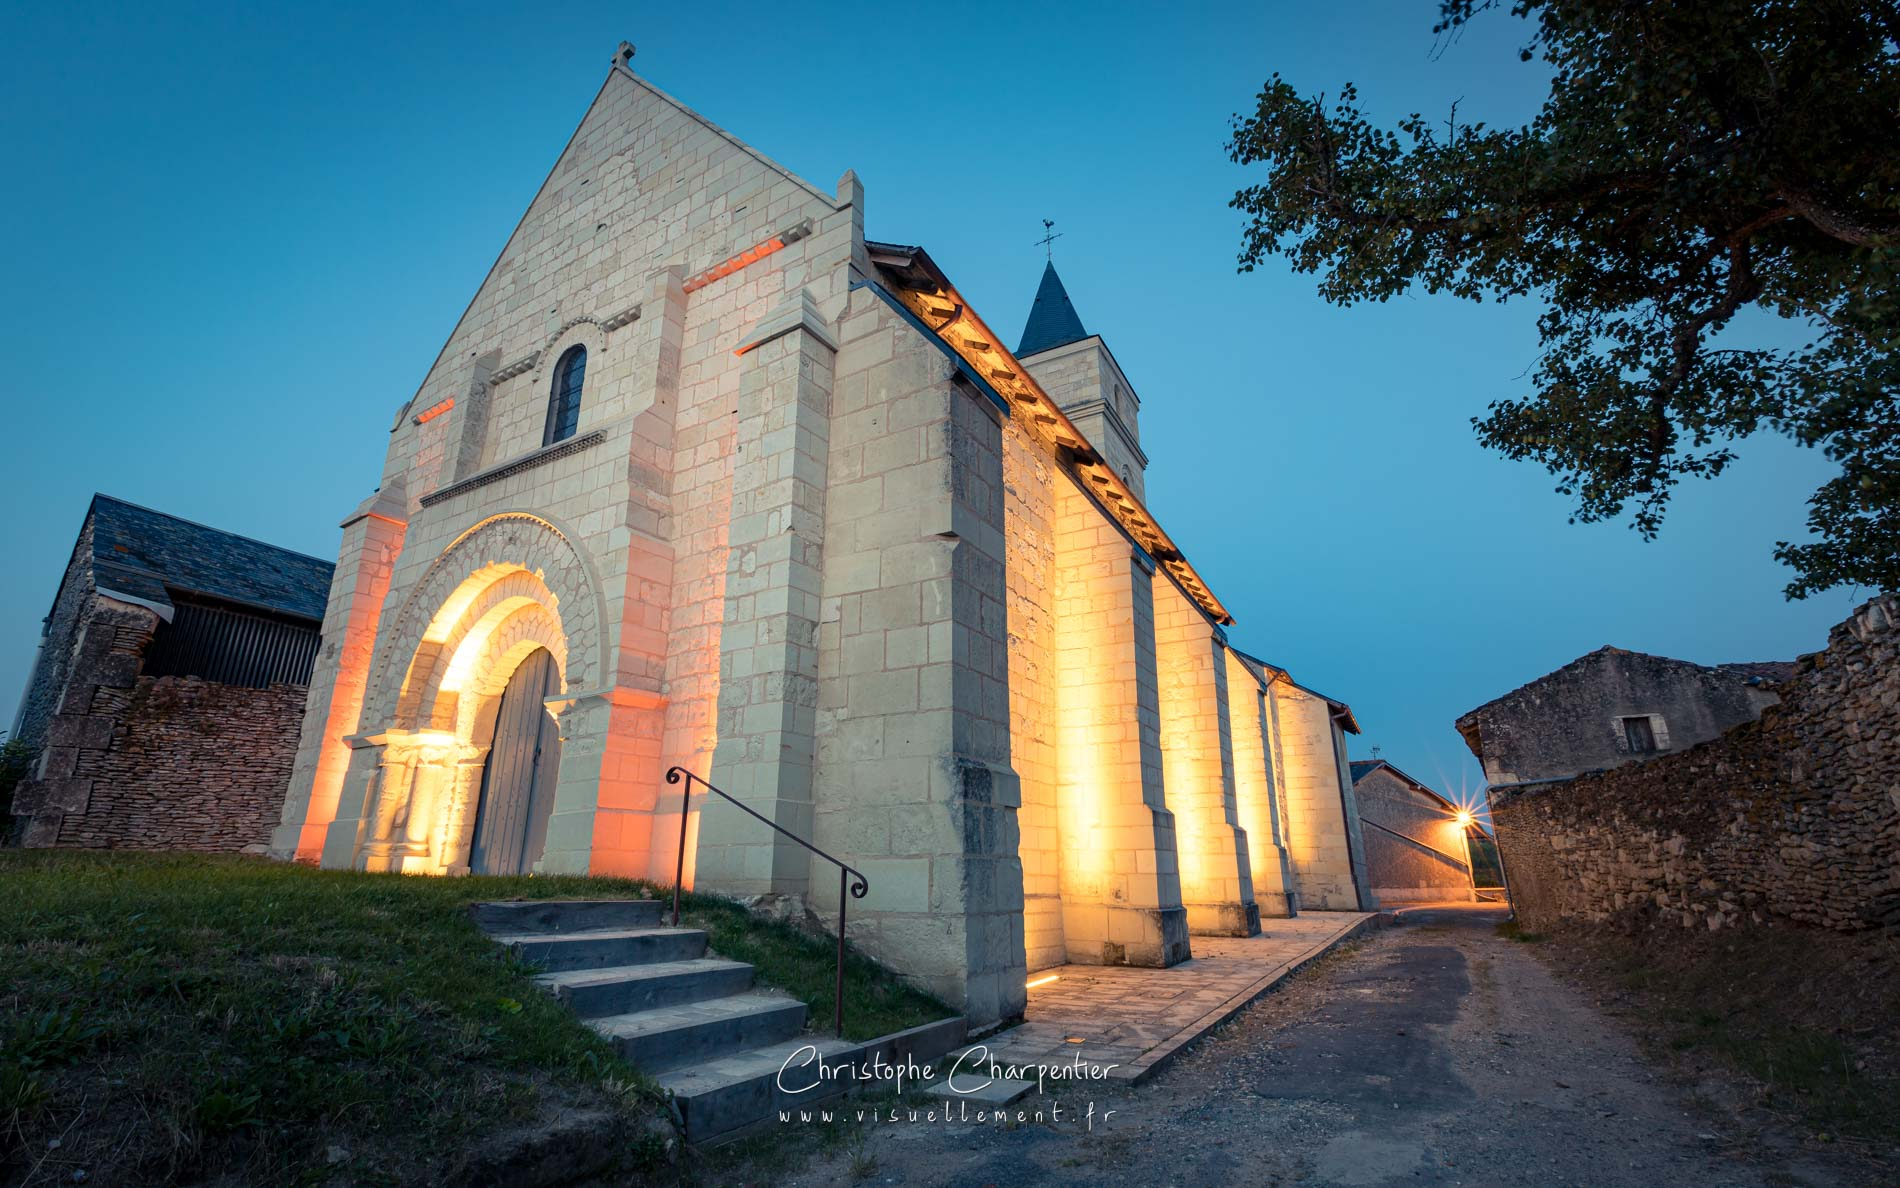 mouterre-silly-village-france-patrimoine (12)